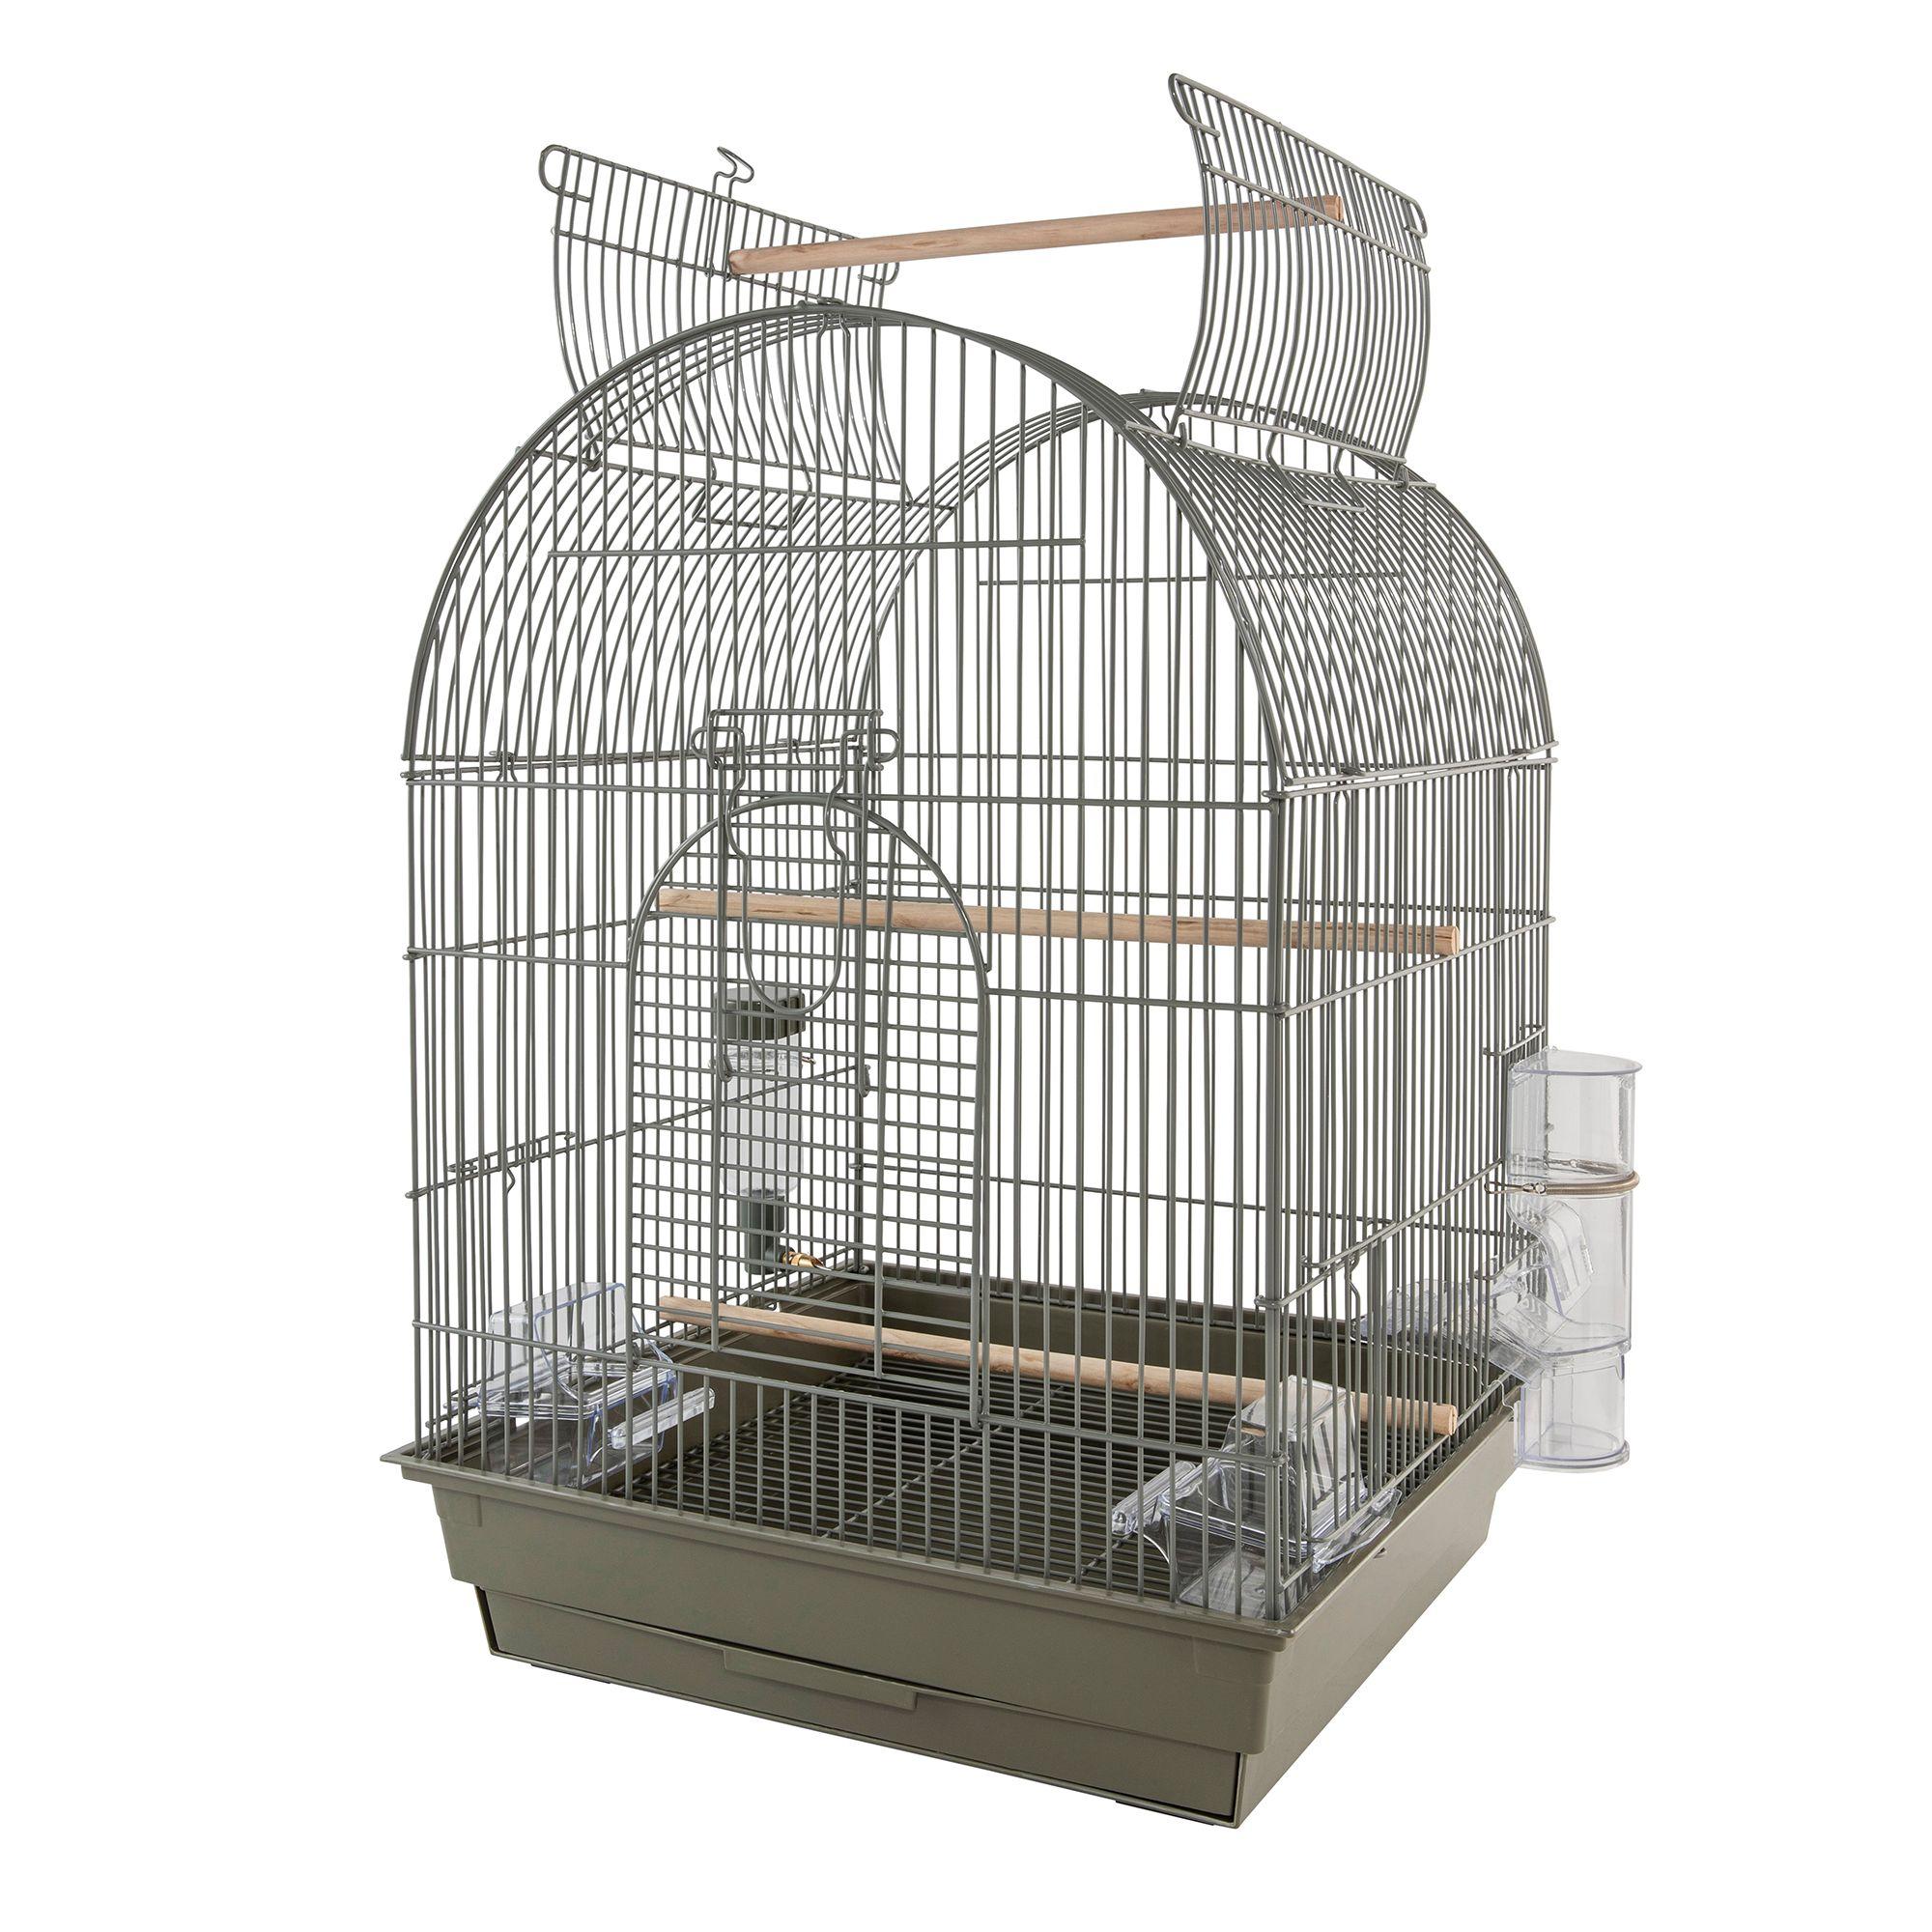 All Living Things® Functional Feeding Bird Home